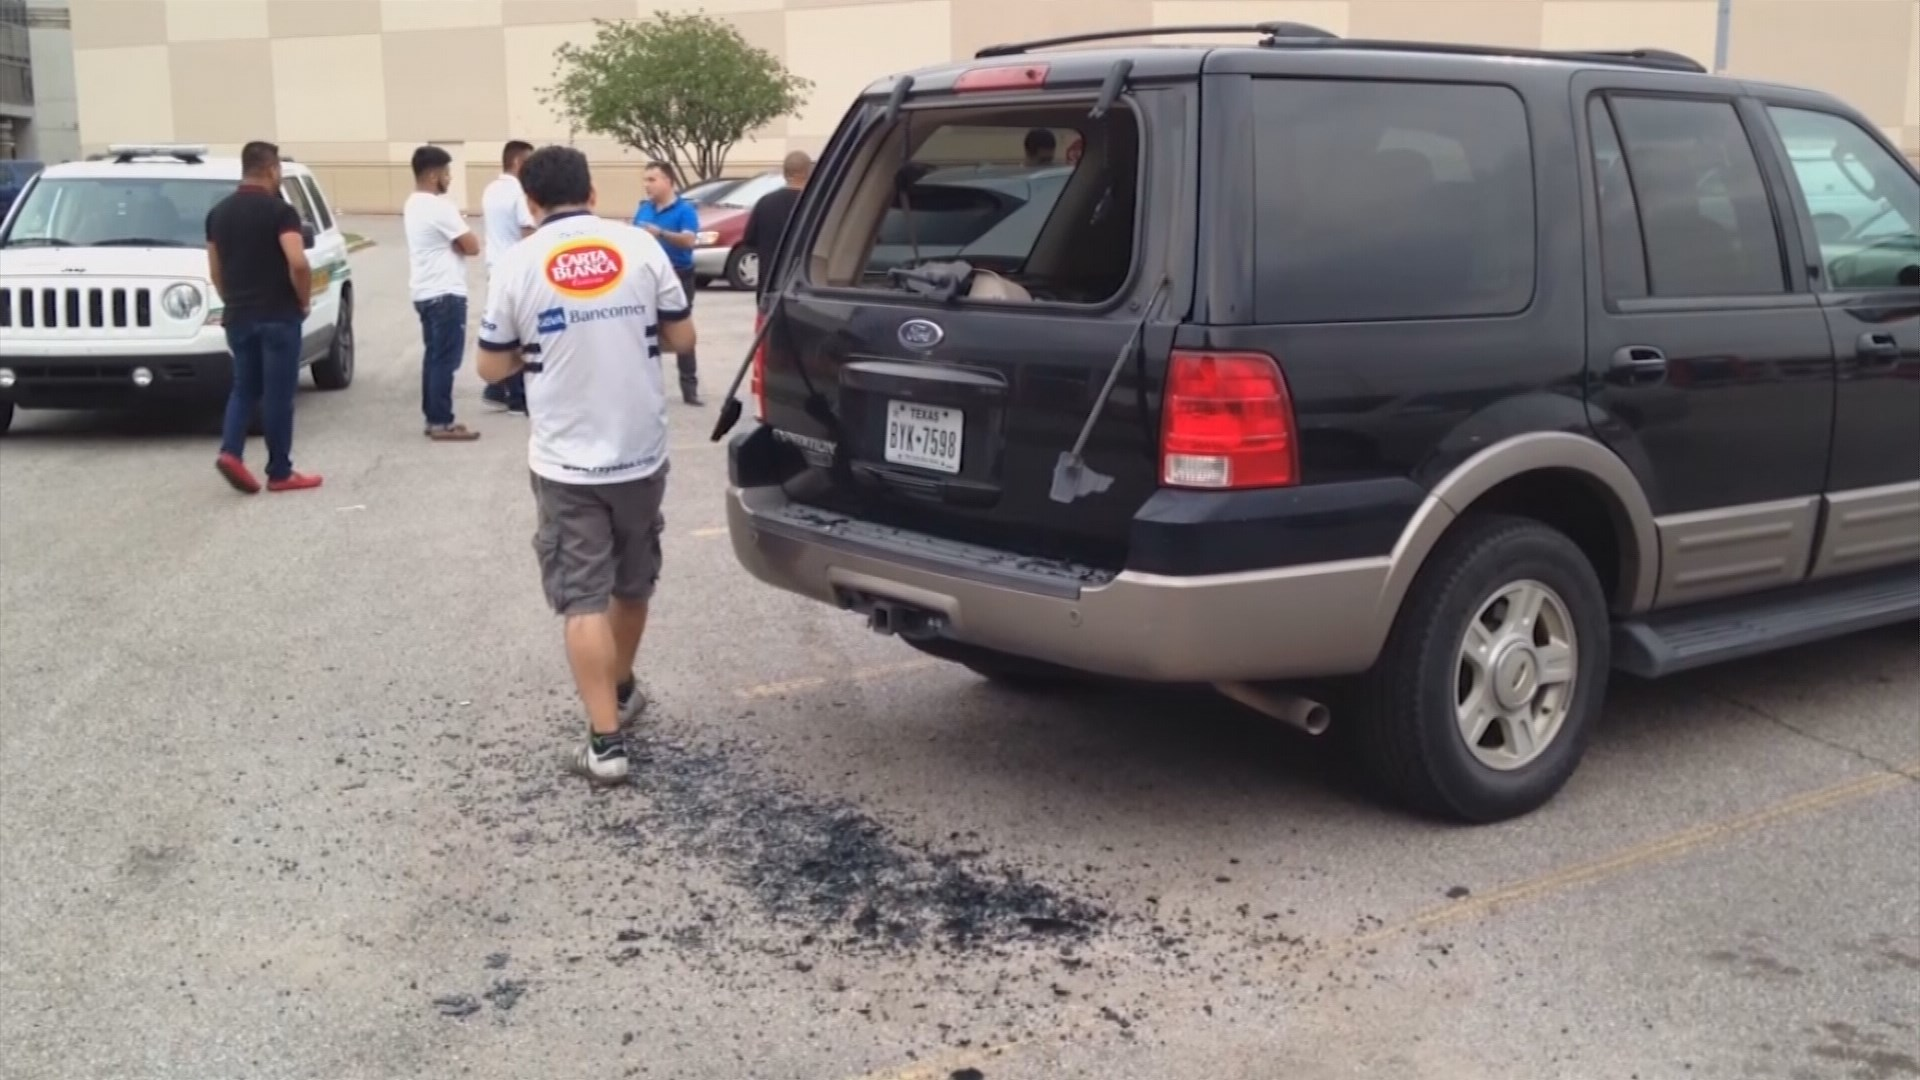 e injured vehicles damaged after BB gun shooting spree at mall